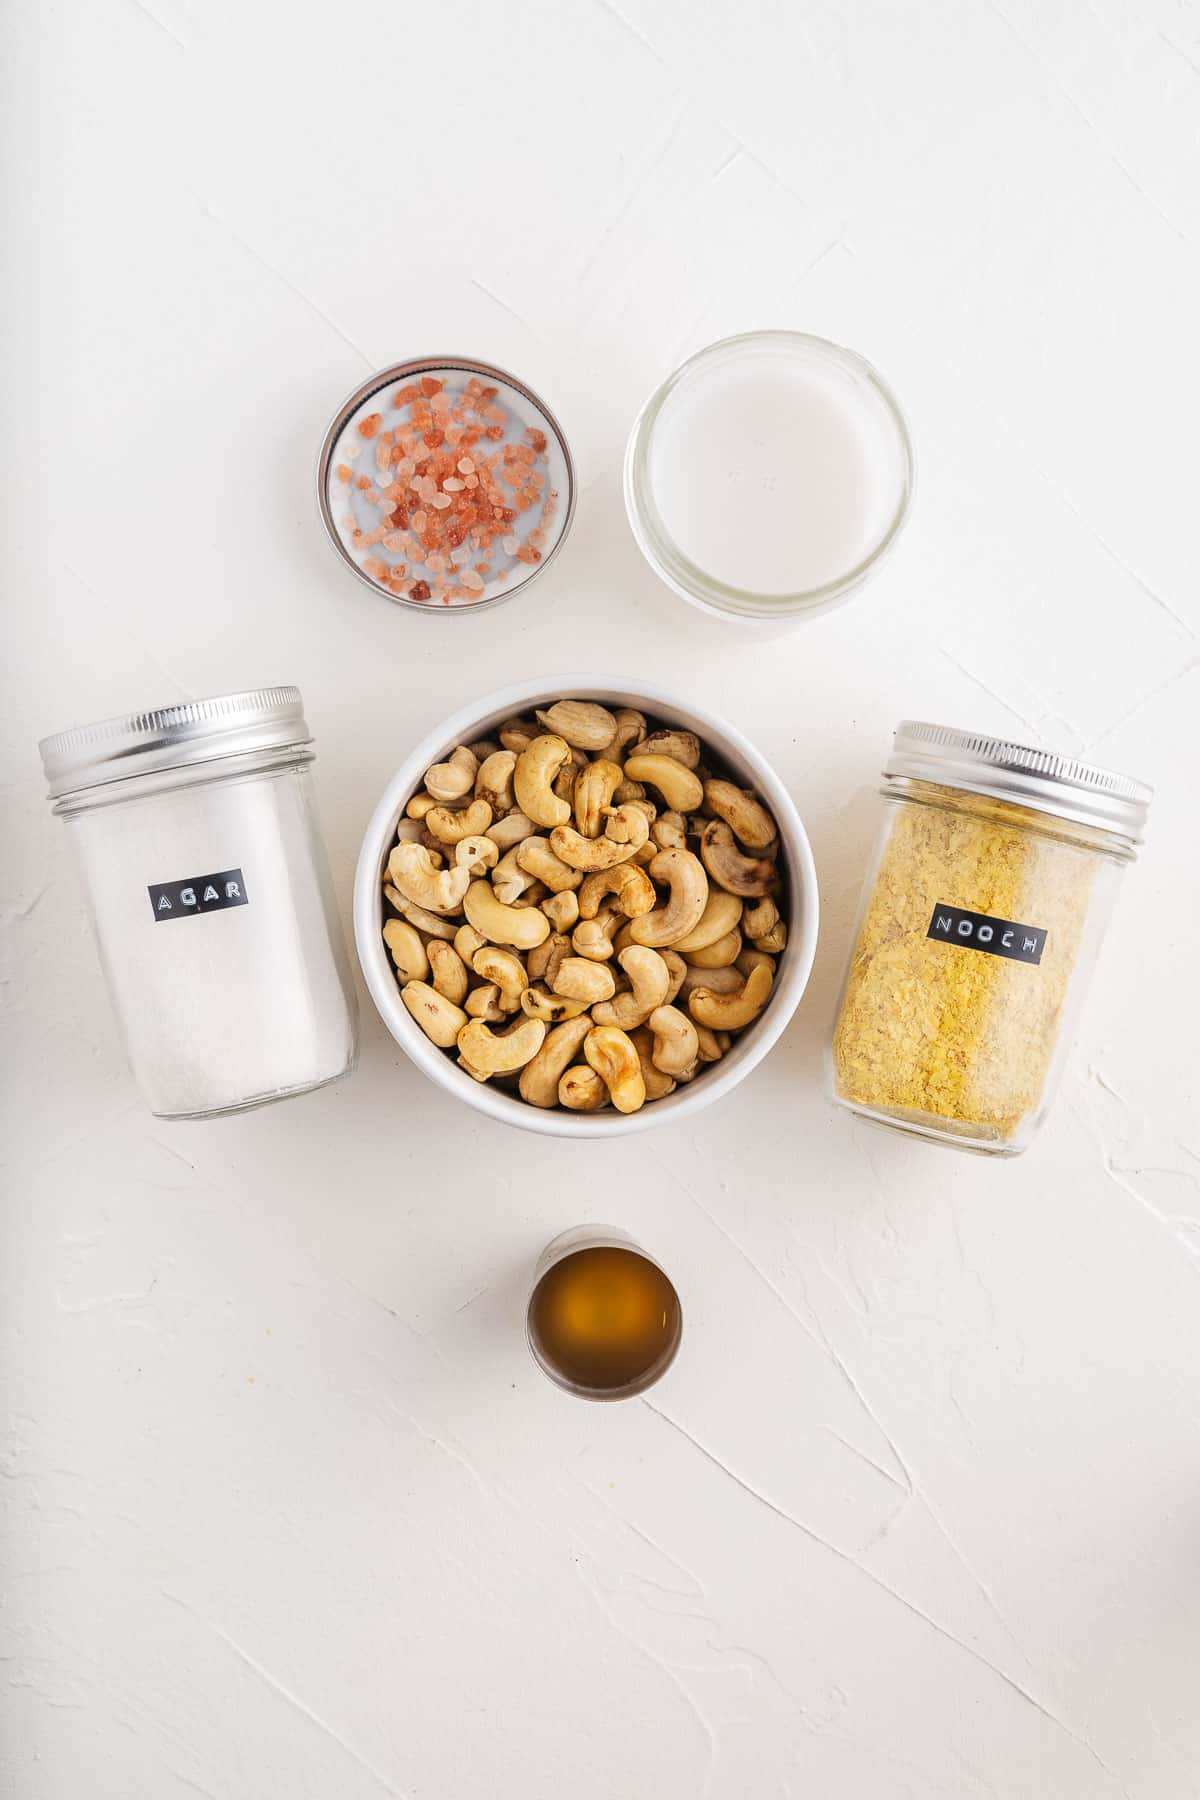 Nutritional Yeast, Salt, Cashews, Milk, Apple Cider Vinegar, and Agar